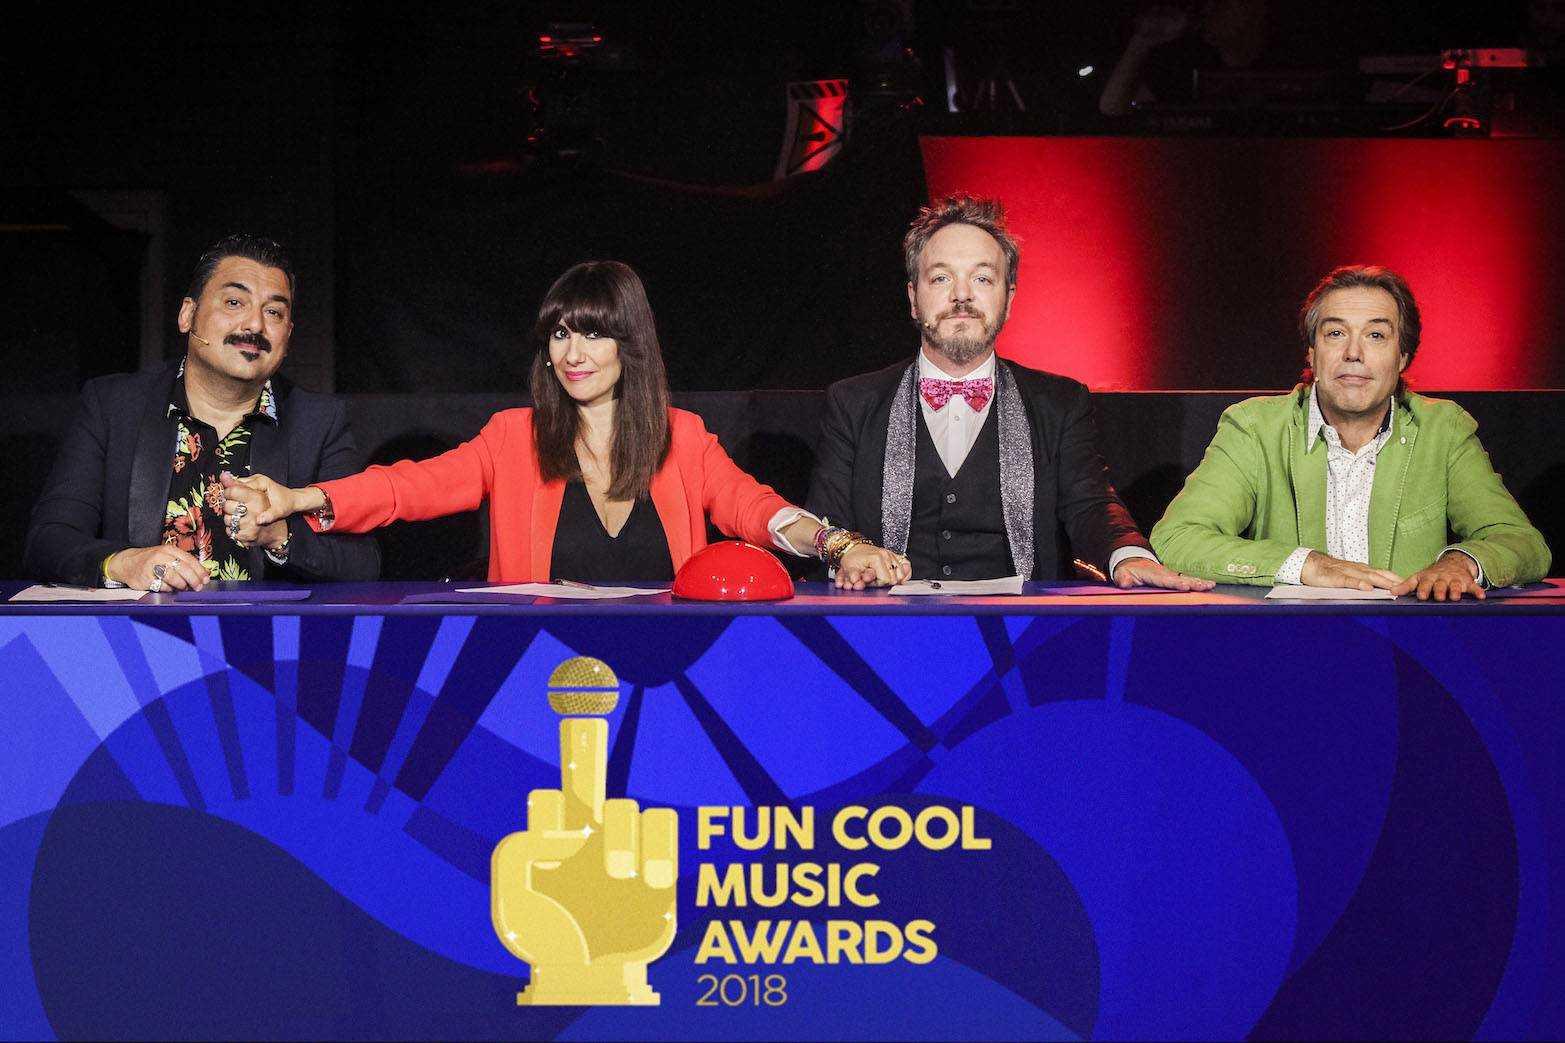 FUN COOL MUSIC AWARD - presenta Marco Maccarini, Giuria: ROY PACI, PAOLA MAUGERI, CORRADO NUZZO, CESAREO